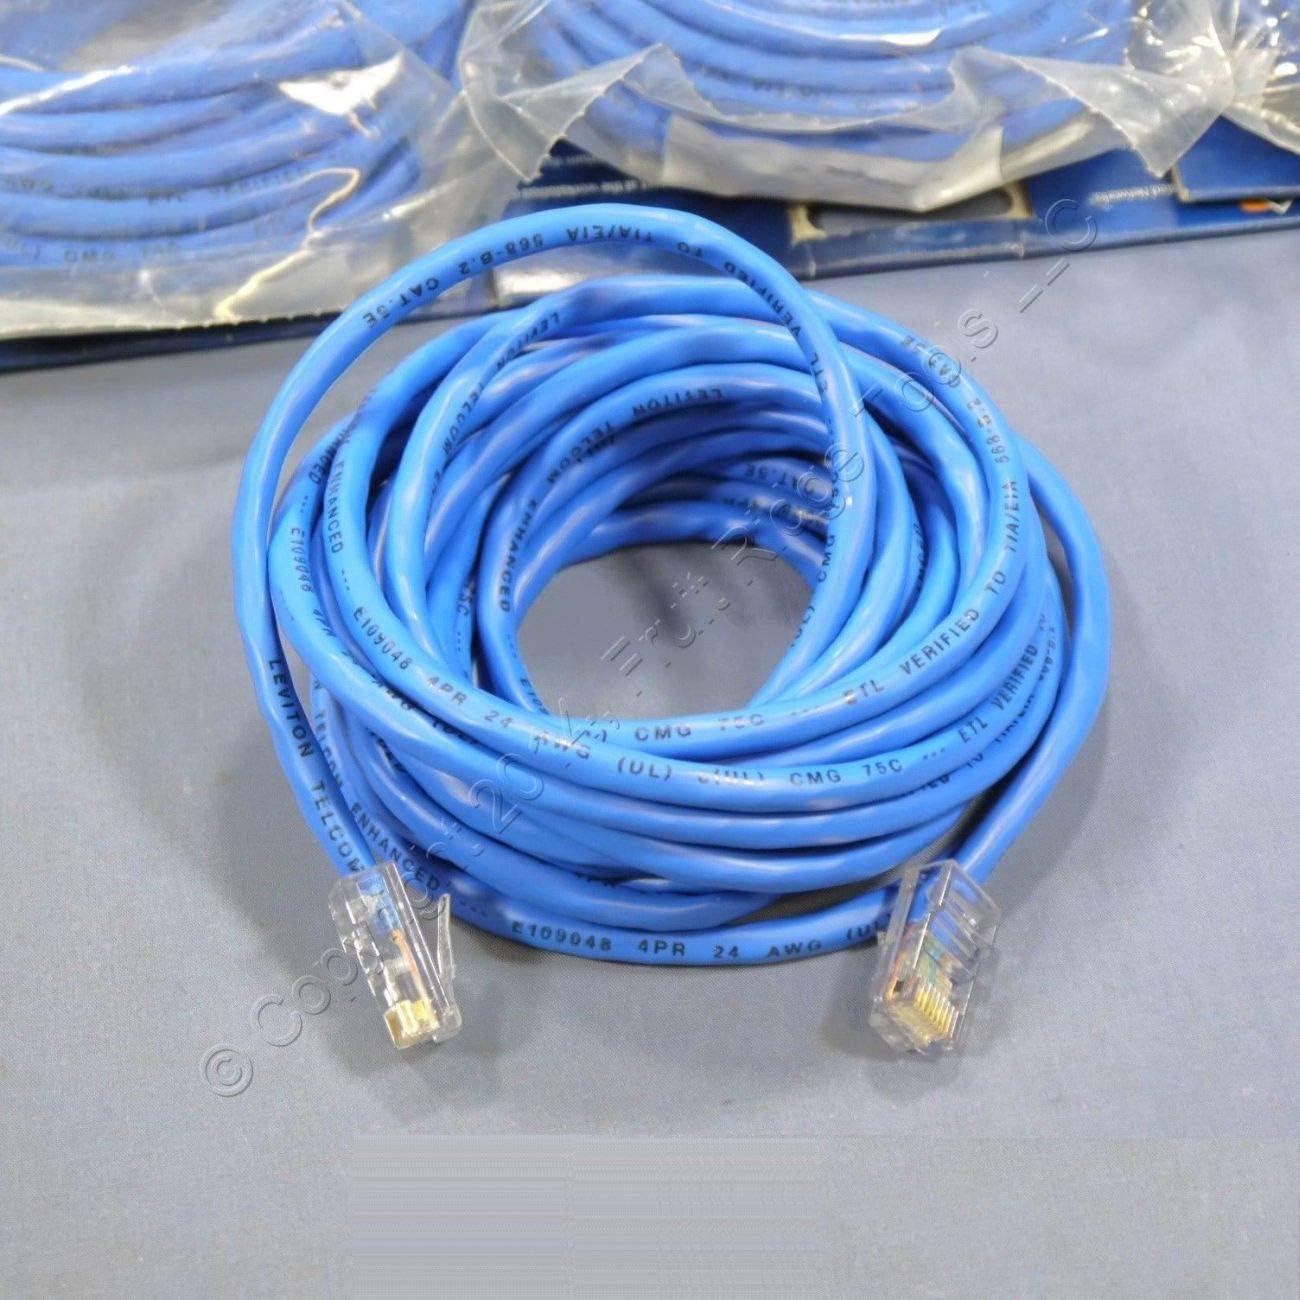 Ethernet LAN Patch Cord Network Cable Blue Leviton 52455-15B 15ft